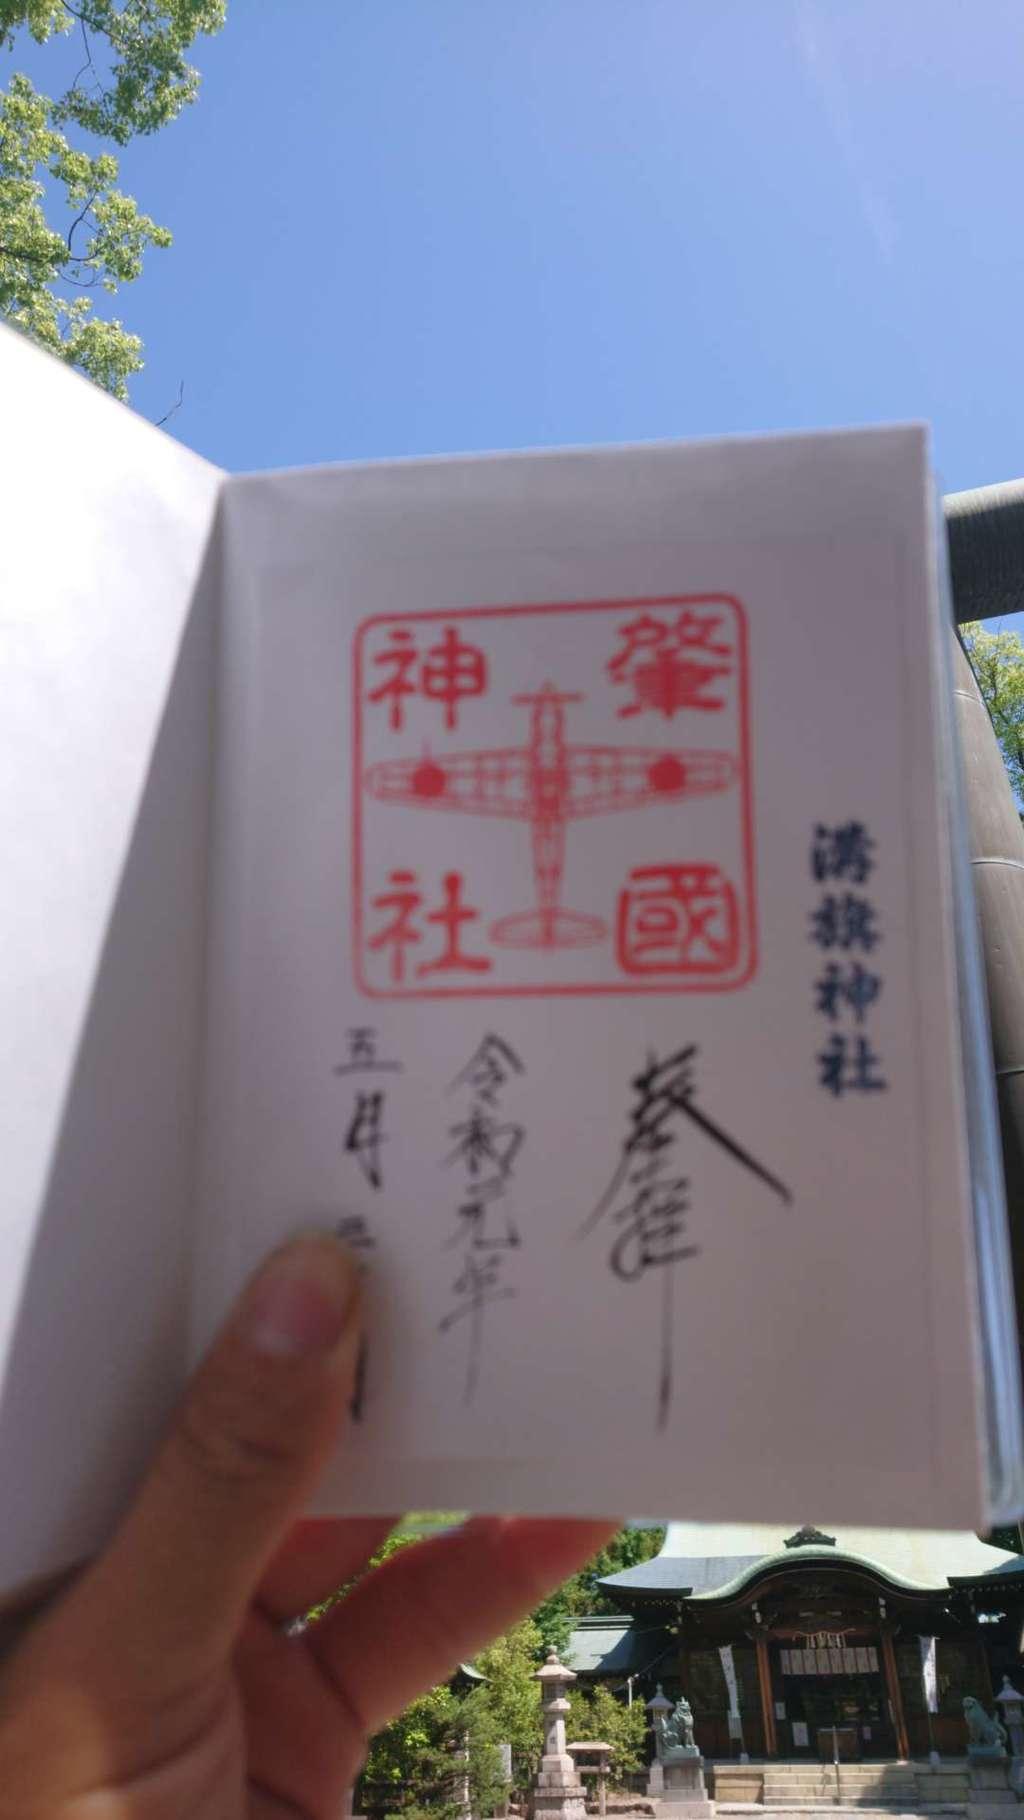 溝旗神社(肇國神社)の御朱印